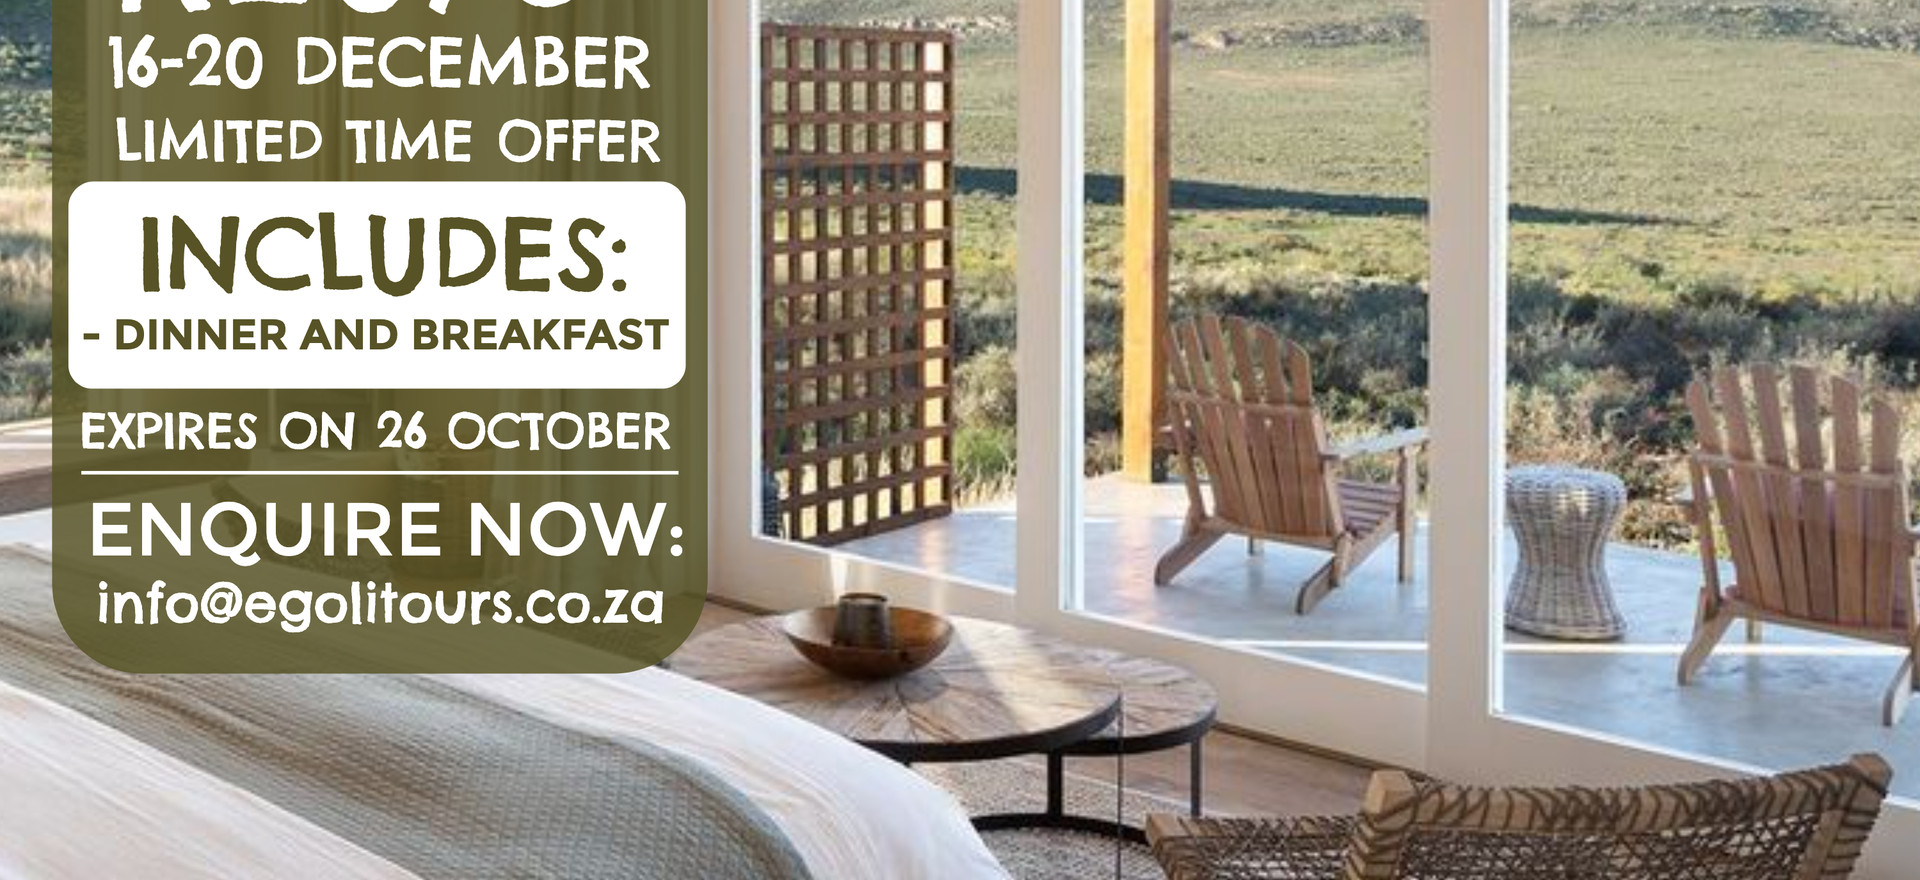 Cederberg Ridge Wilderness Lodge 16.12.2020 - 20.12.2020